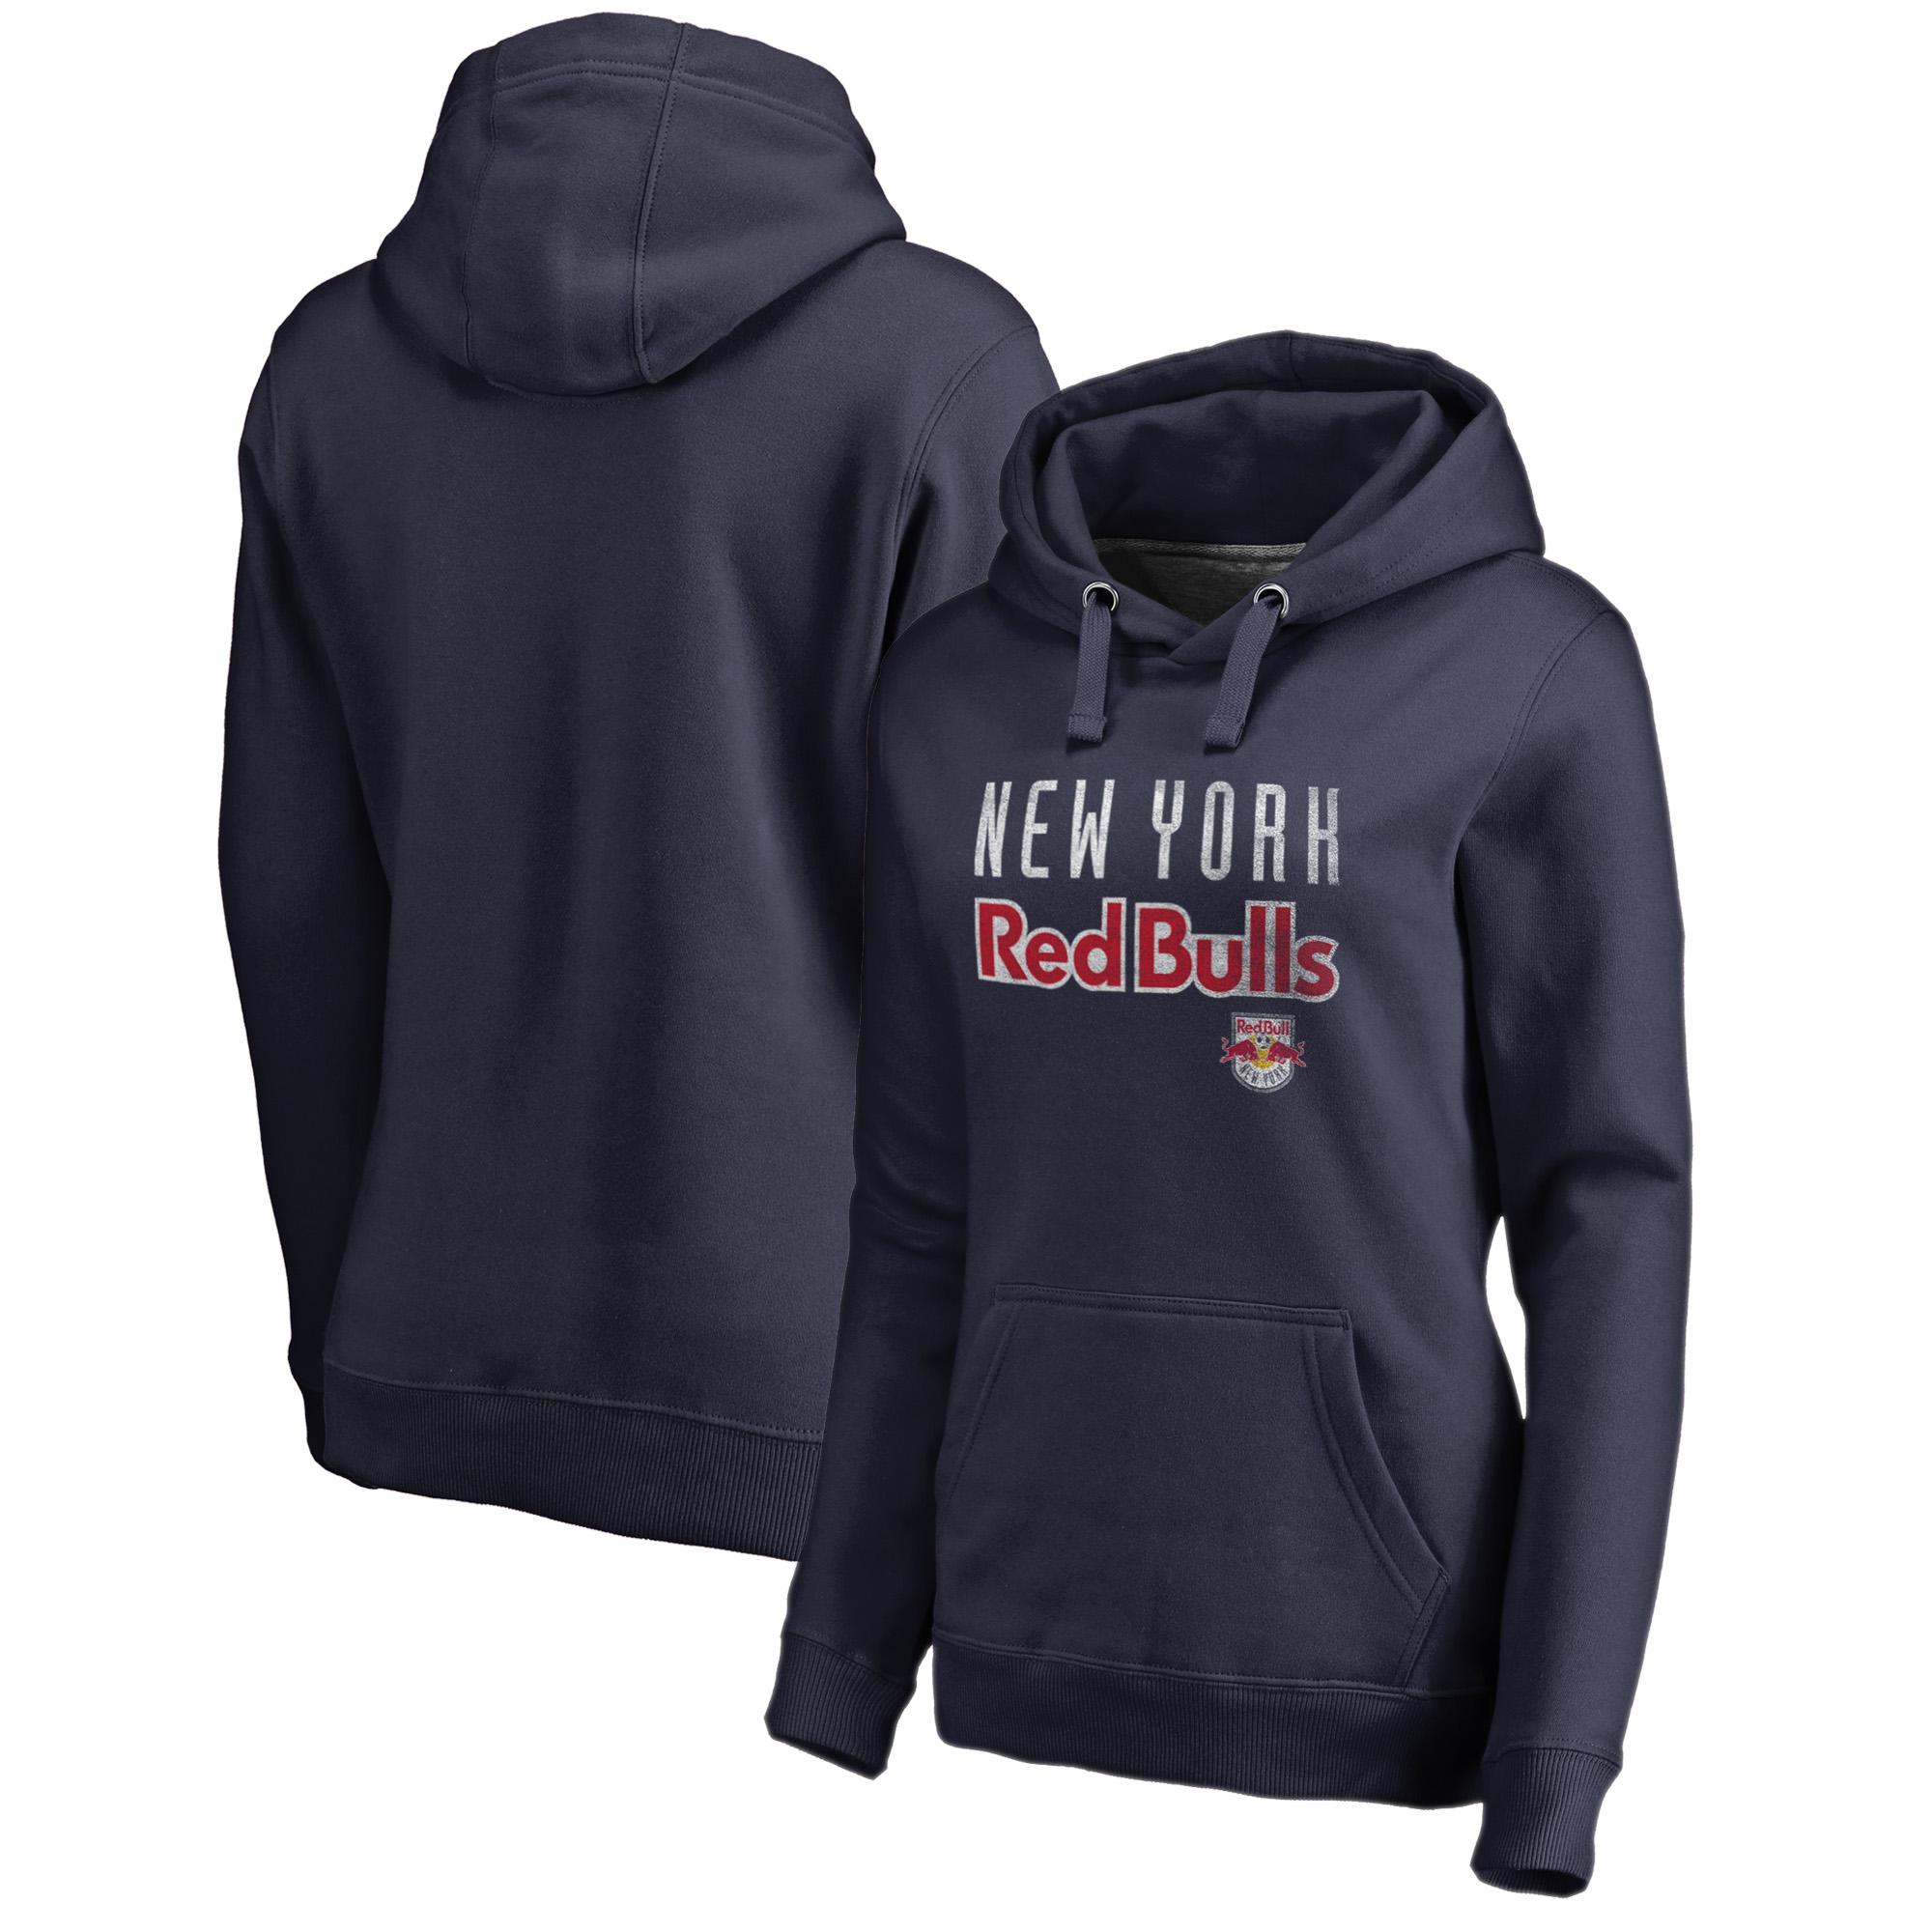 New York Red Bulls Fanatics Branded Women's Graceful Pullover Hoodie - Navy